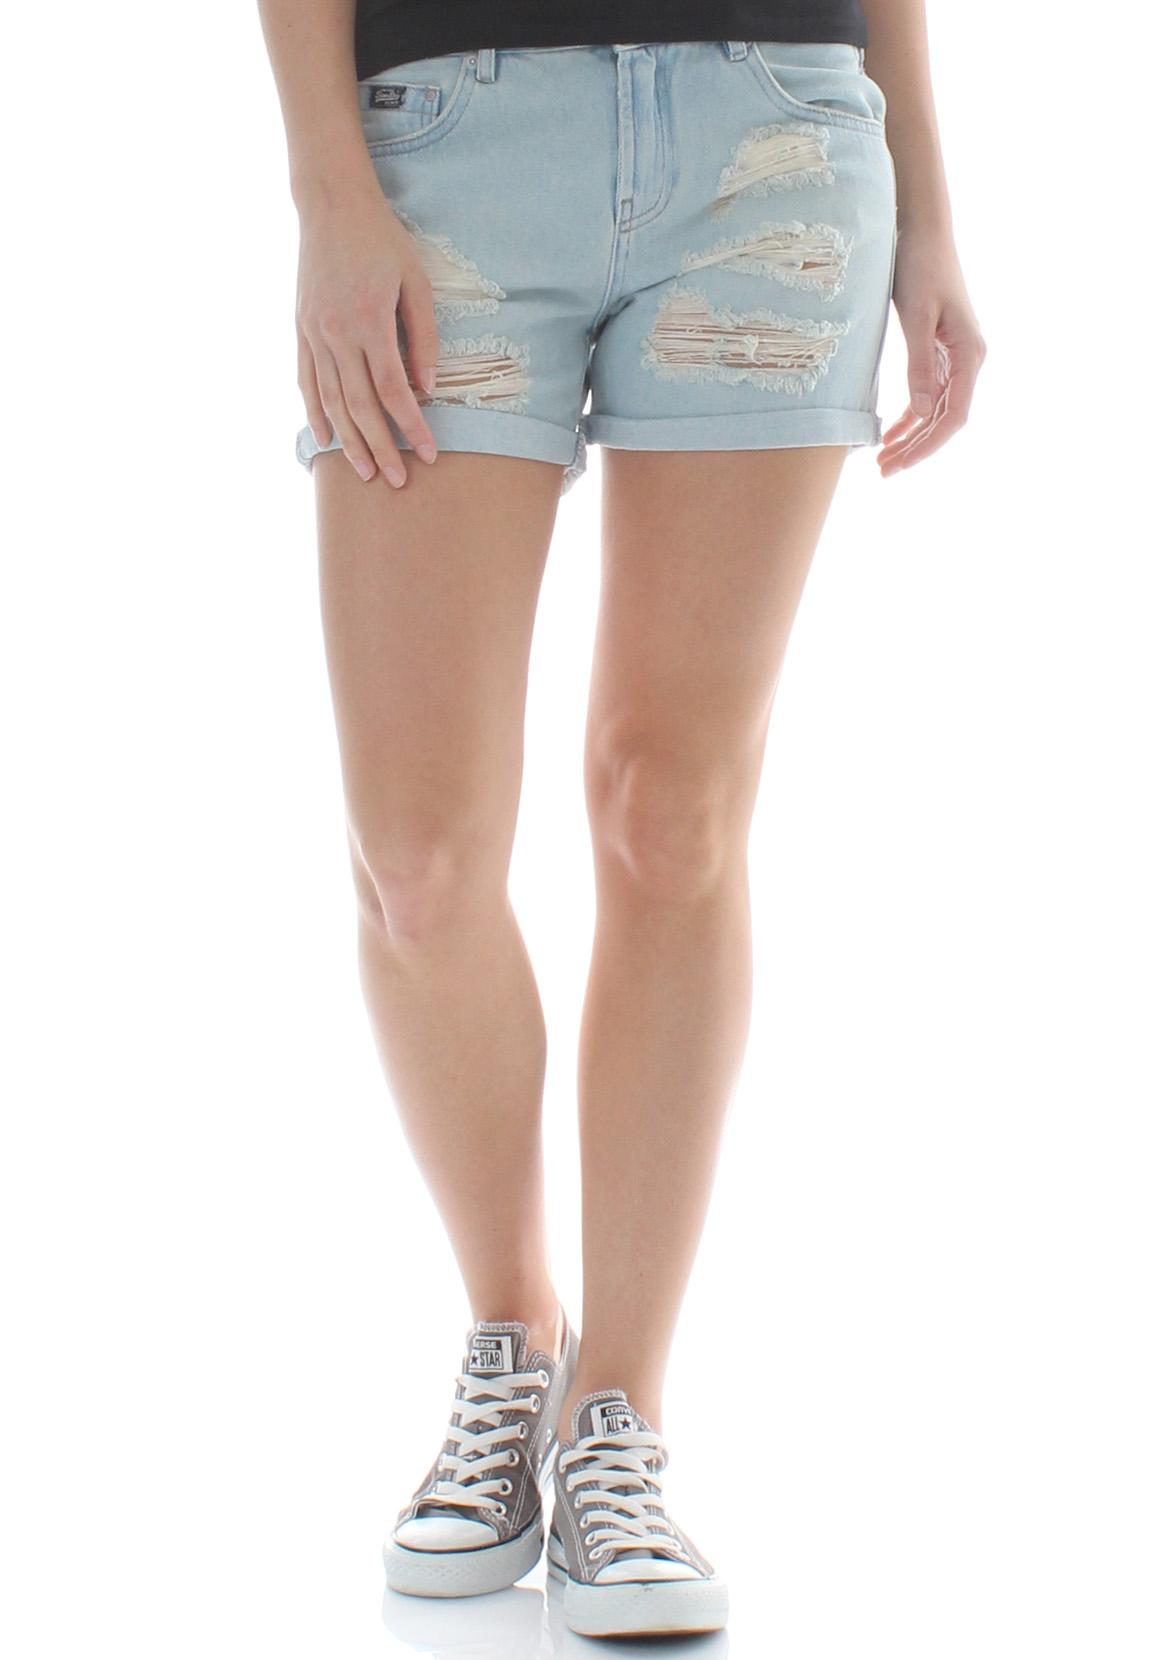 Superdry Shorts Women Steph Boyfriend Shorts Holiday Blue   eBay 39ddba9c4e0e